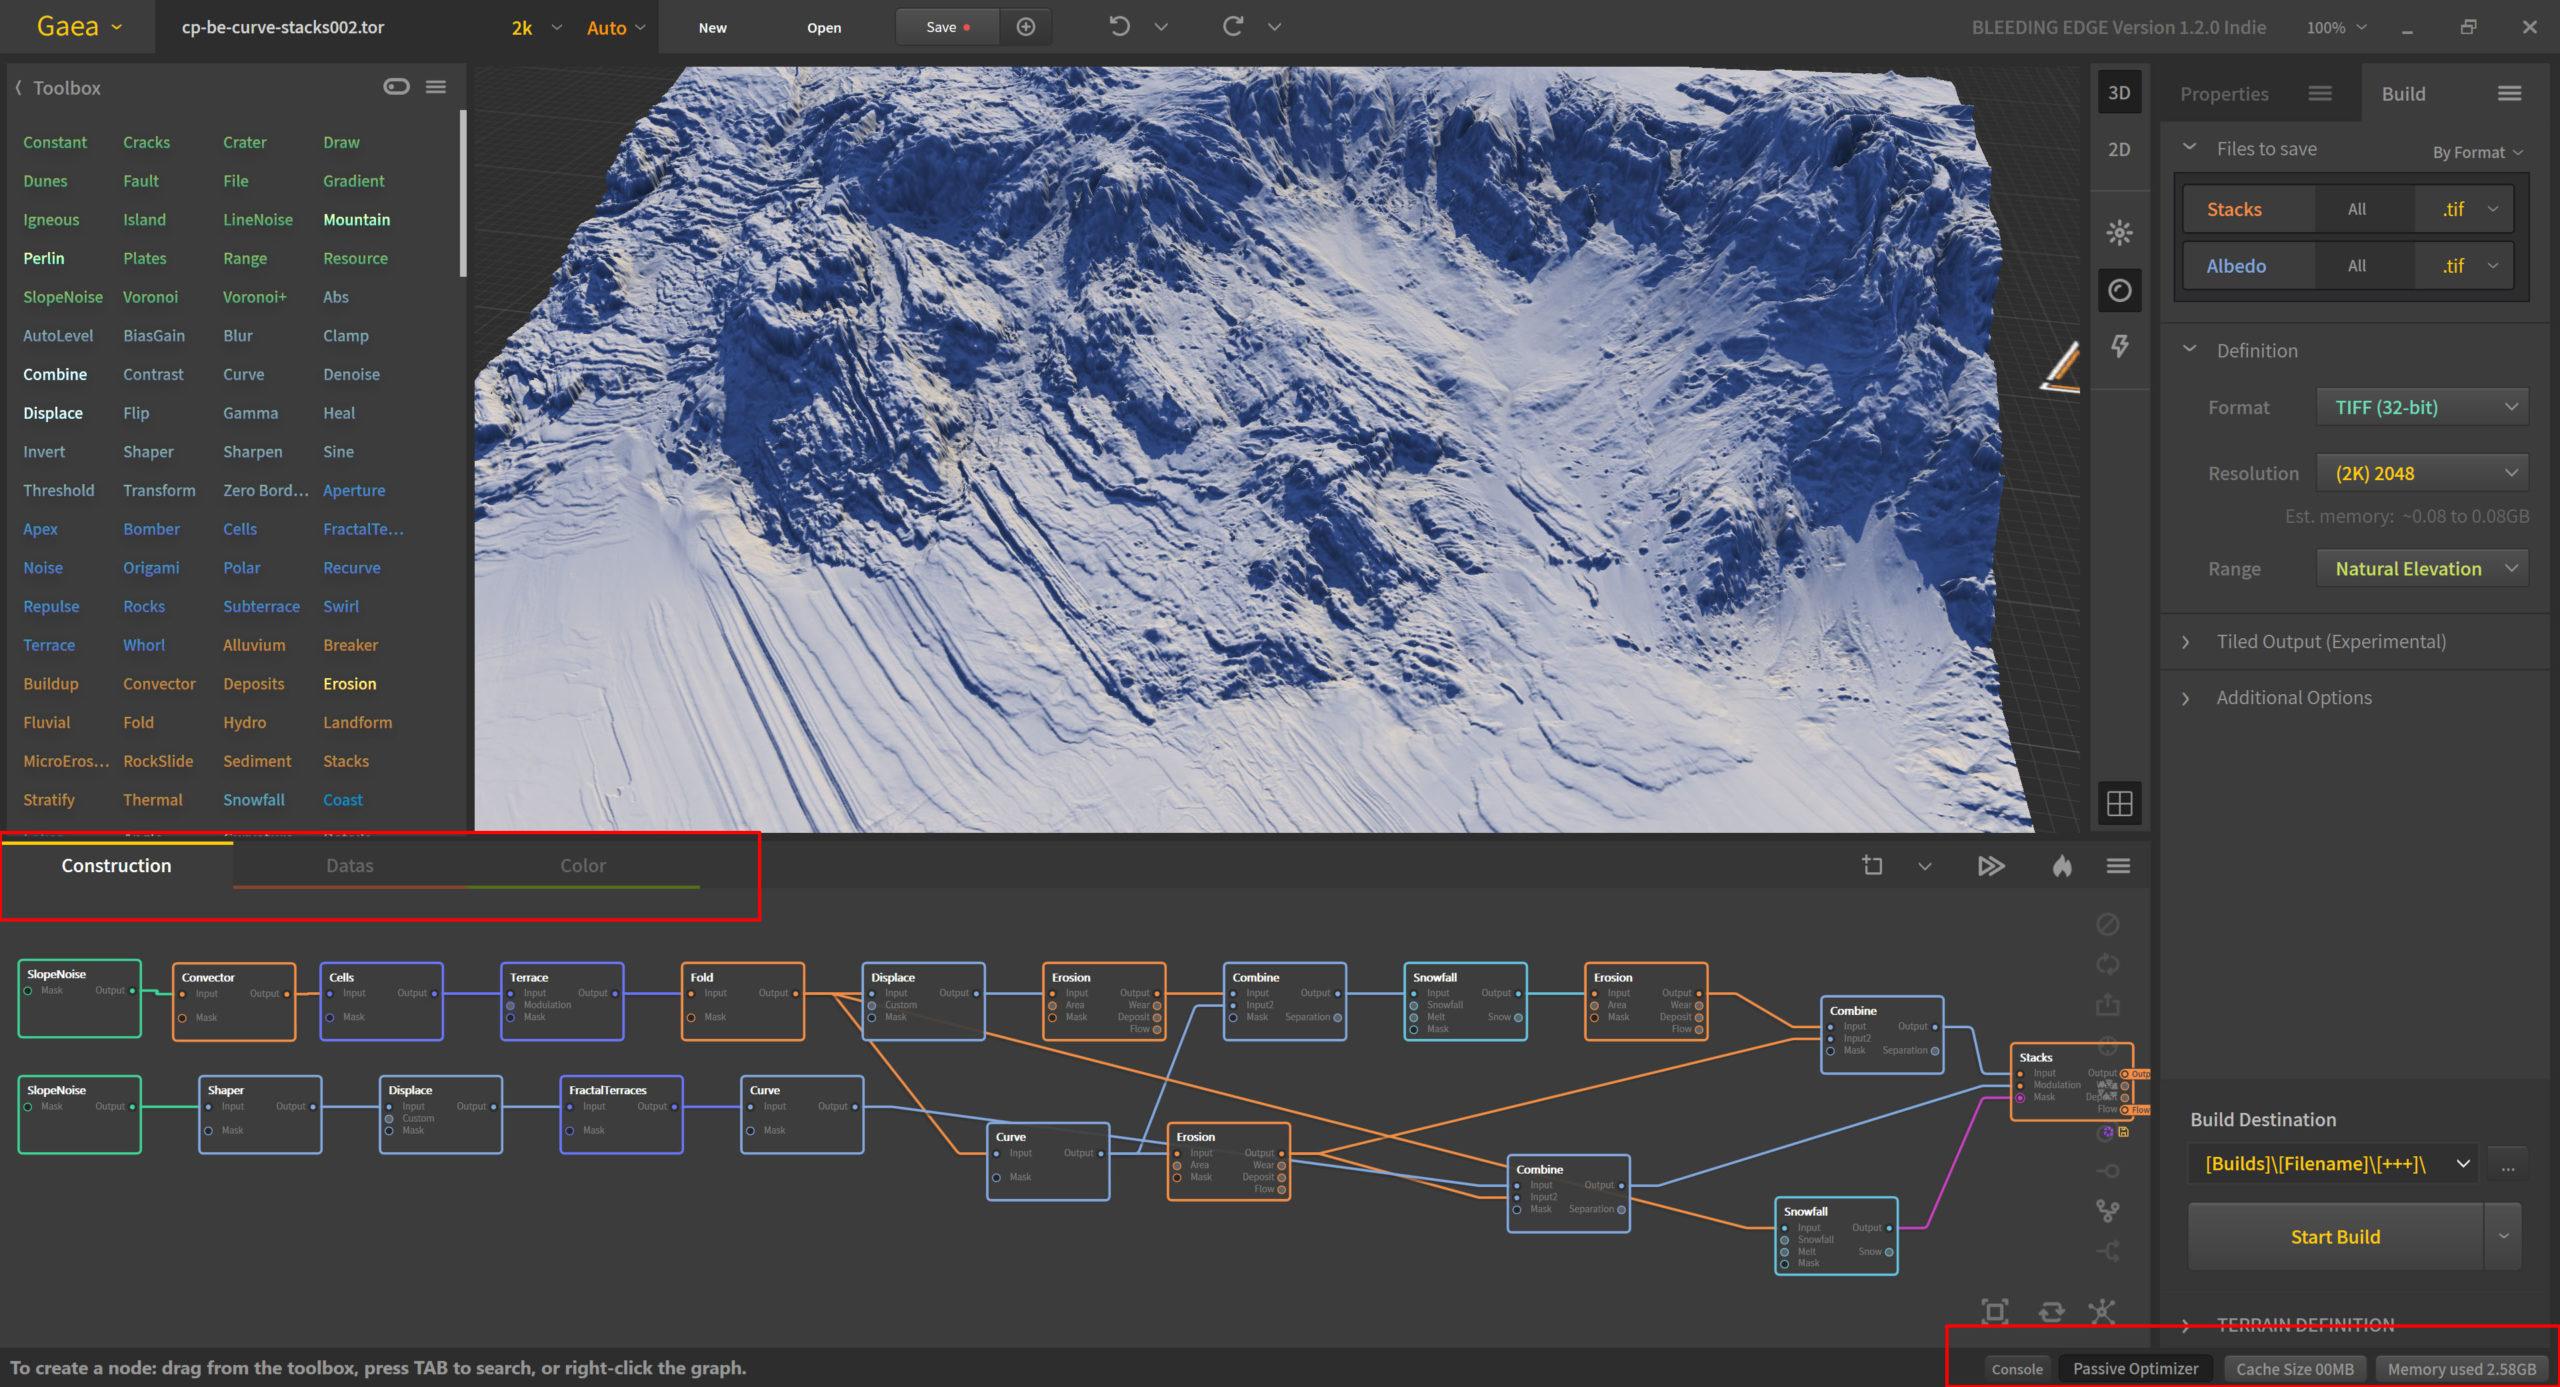 Quadspinner Gaea Bleeding Edge 1.2.0.0 Graphs and Cache